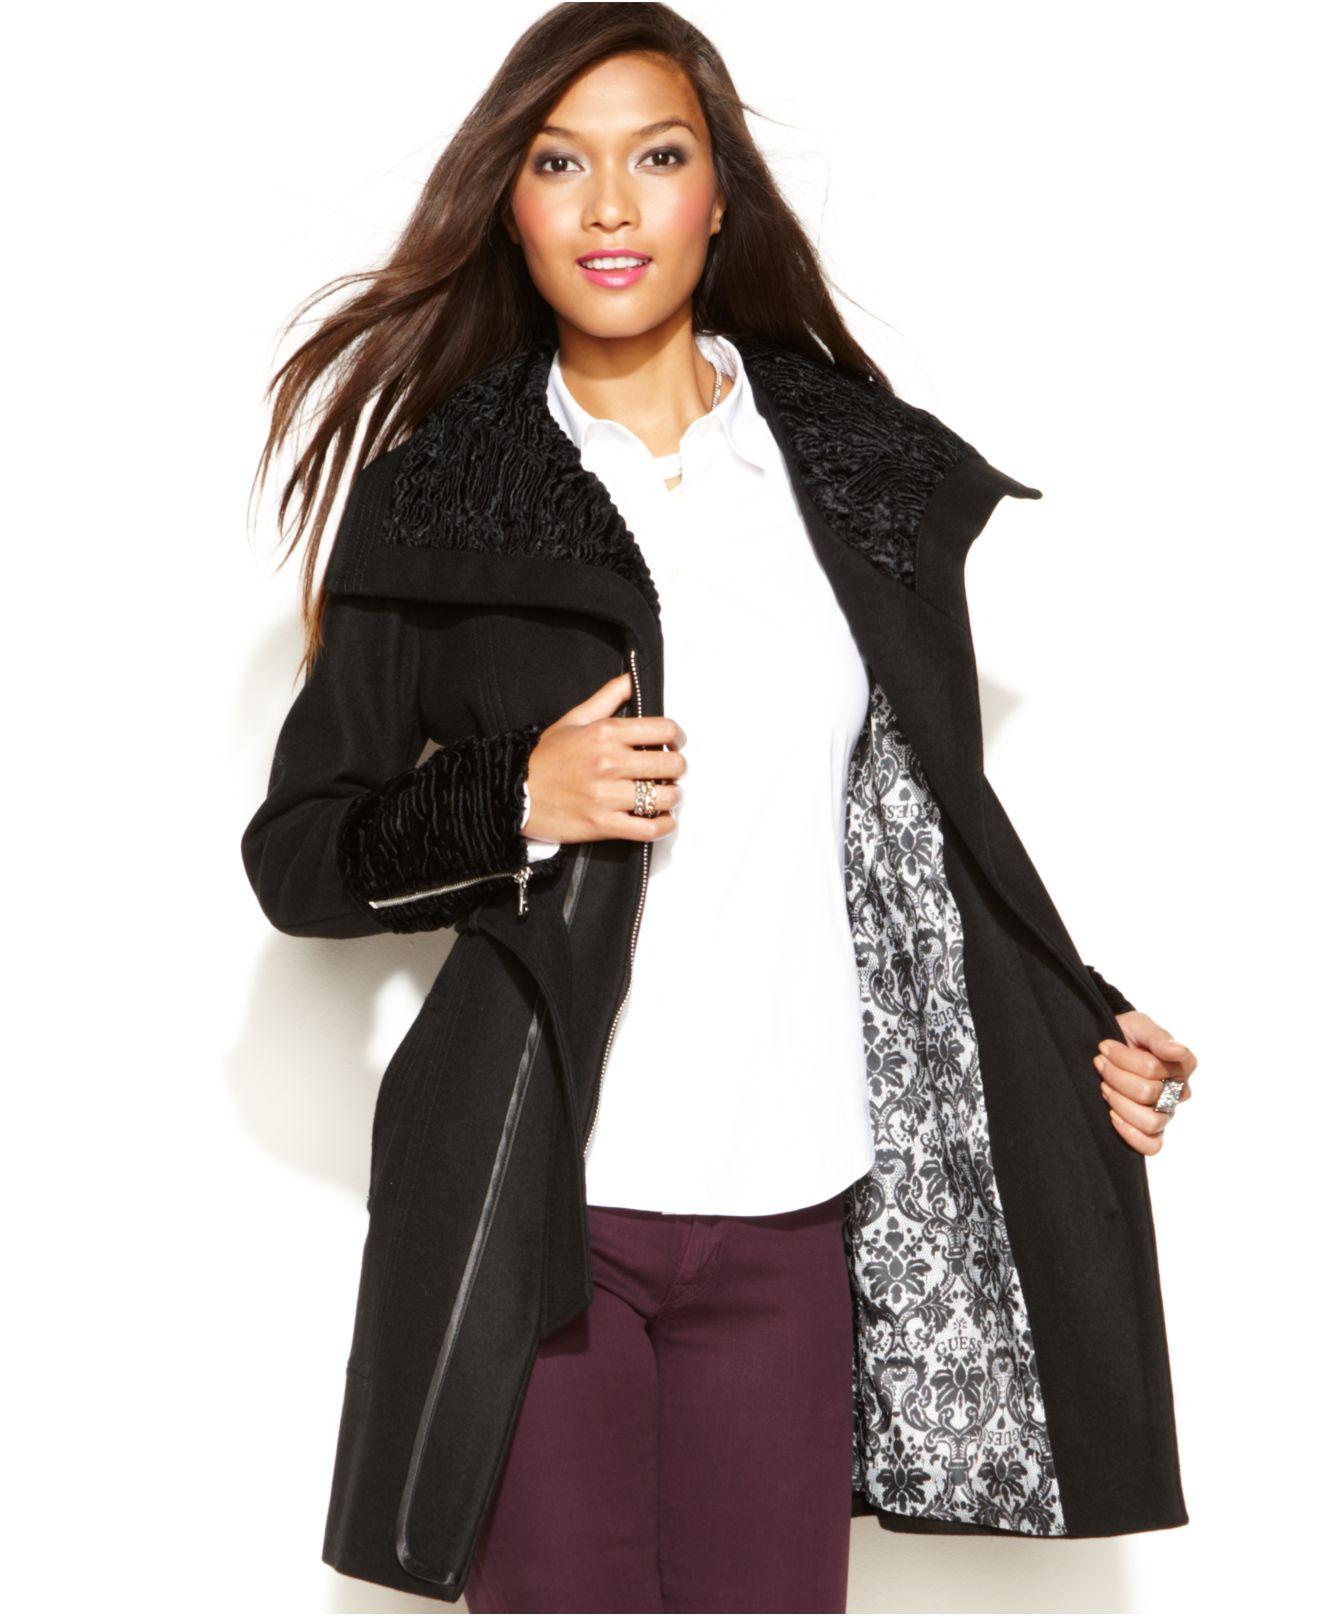 Guess Wool-Blend Faux-Fur-Trim Belted Coat in Black - Lyst